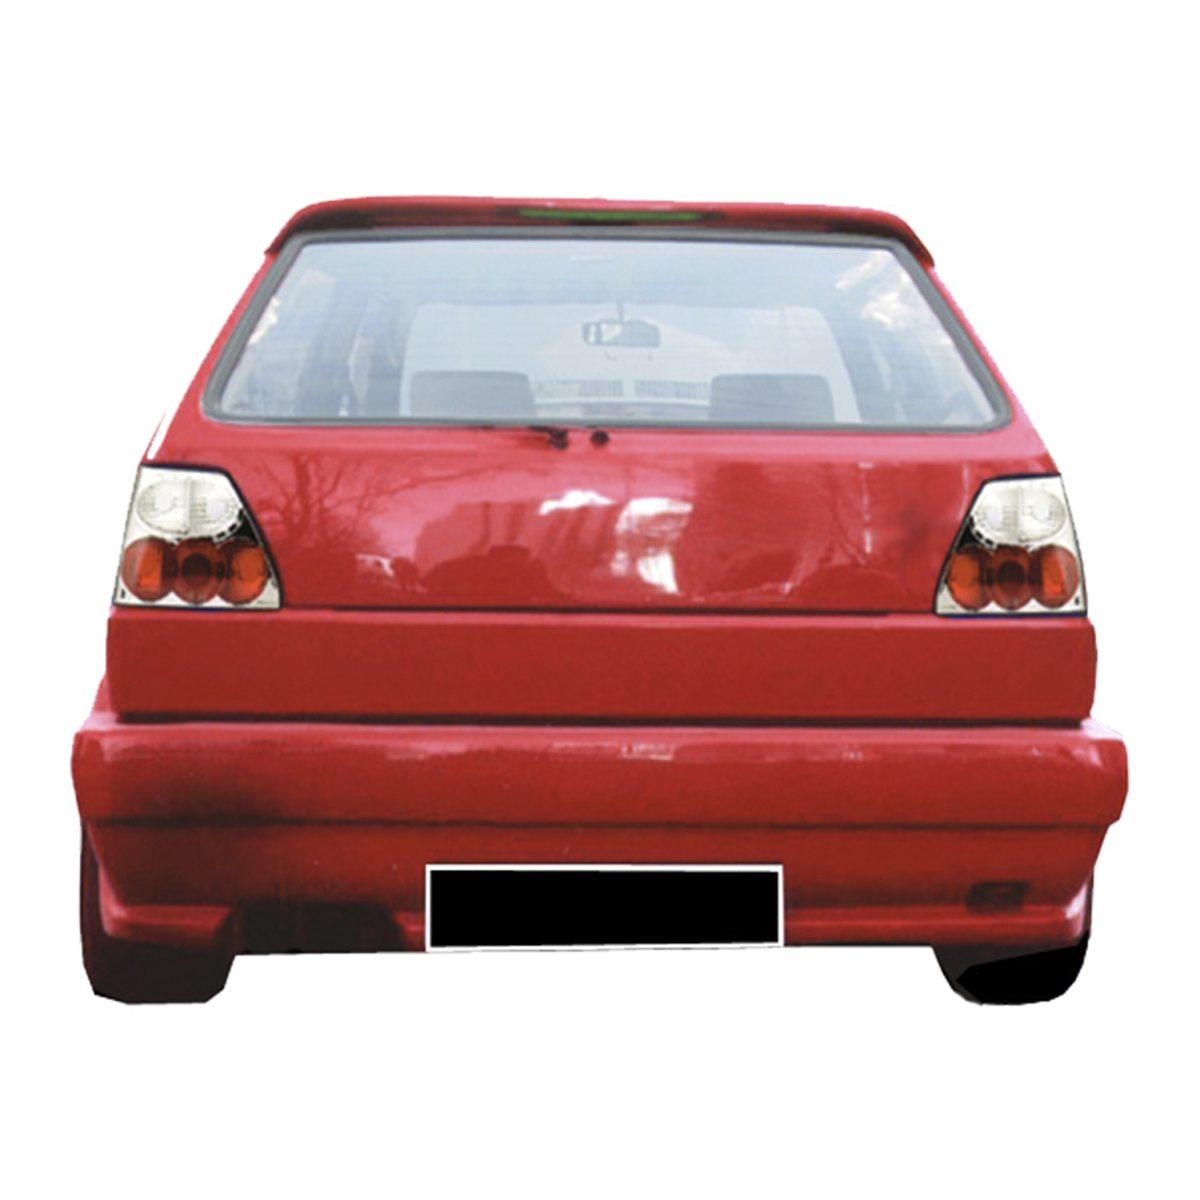 VW-Golf-II-Cup-Tras-PCC034